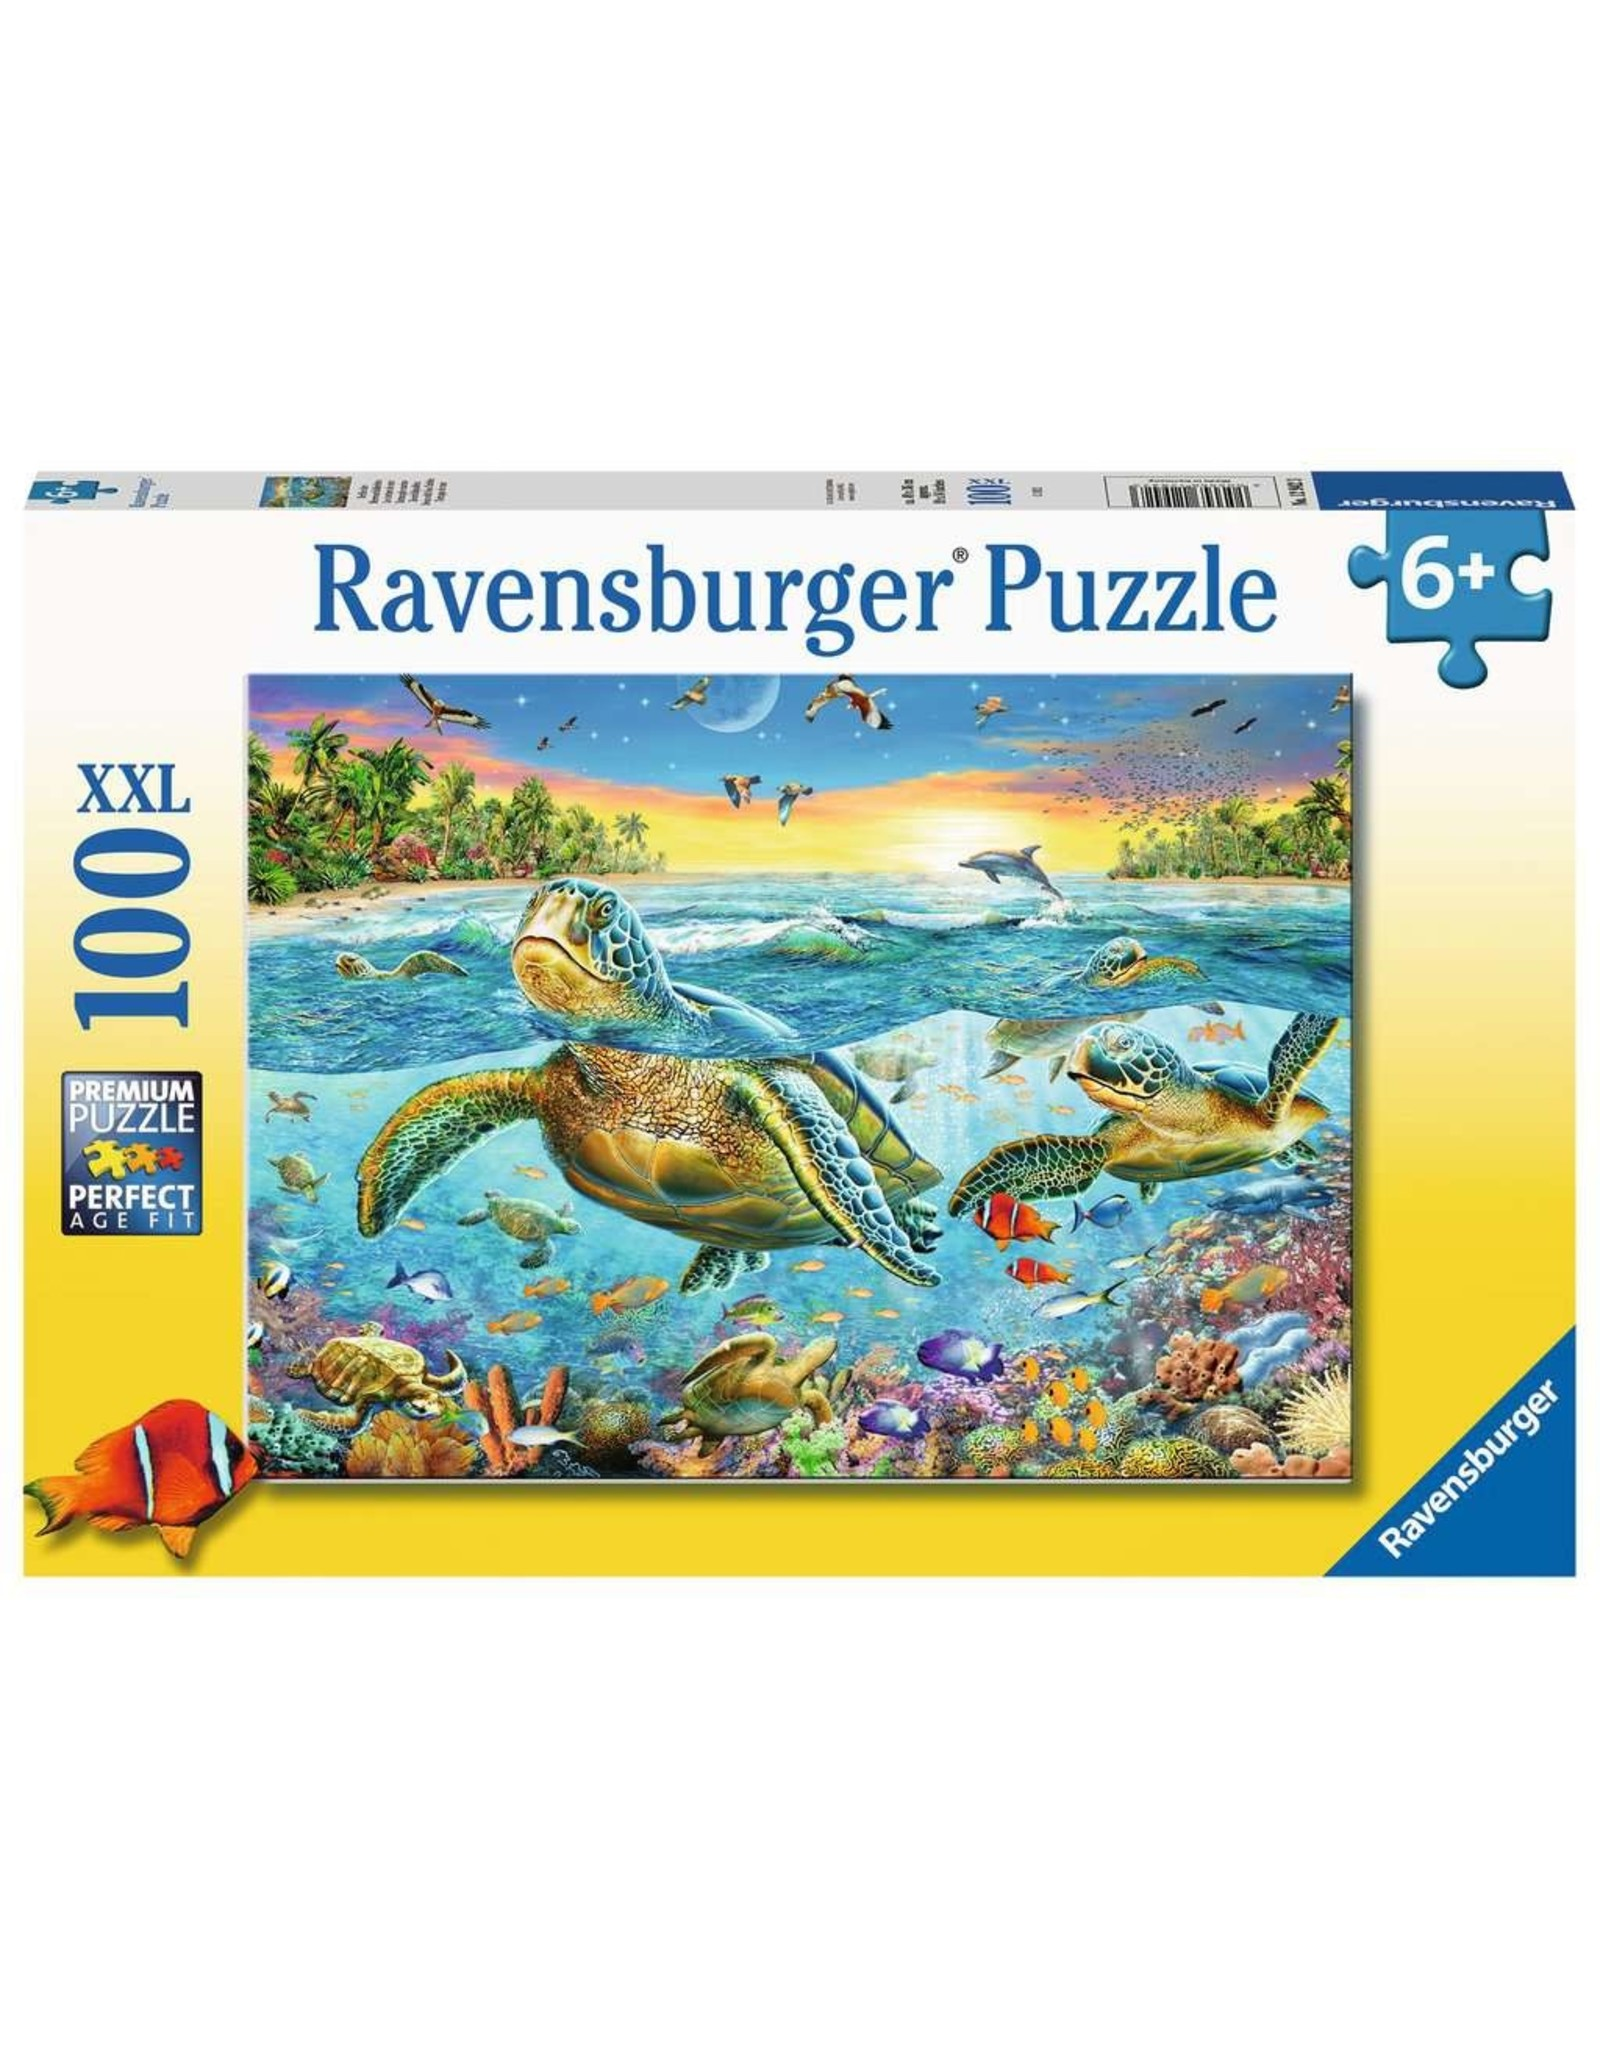 Ravensburger 100 pcs. Swim With Sea Turtles Puzzle